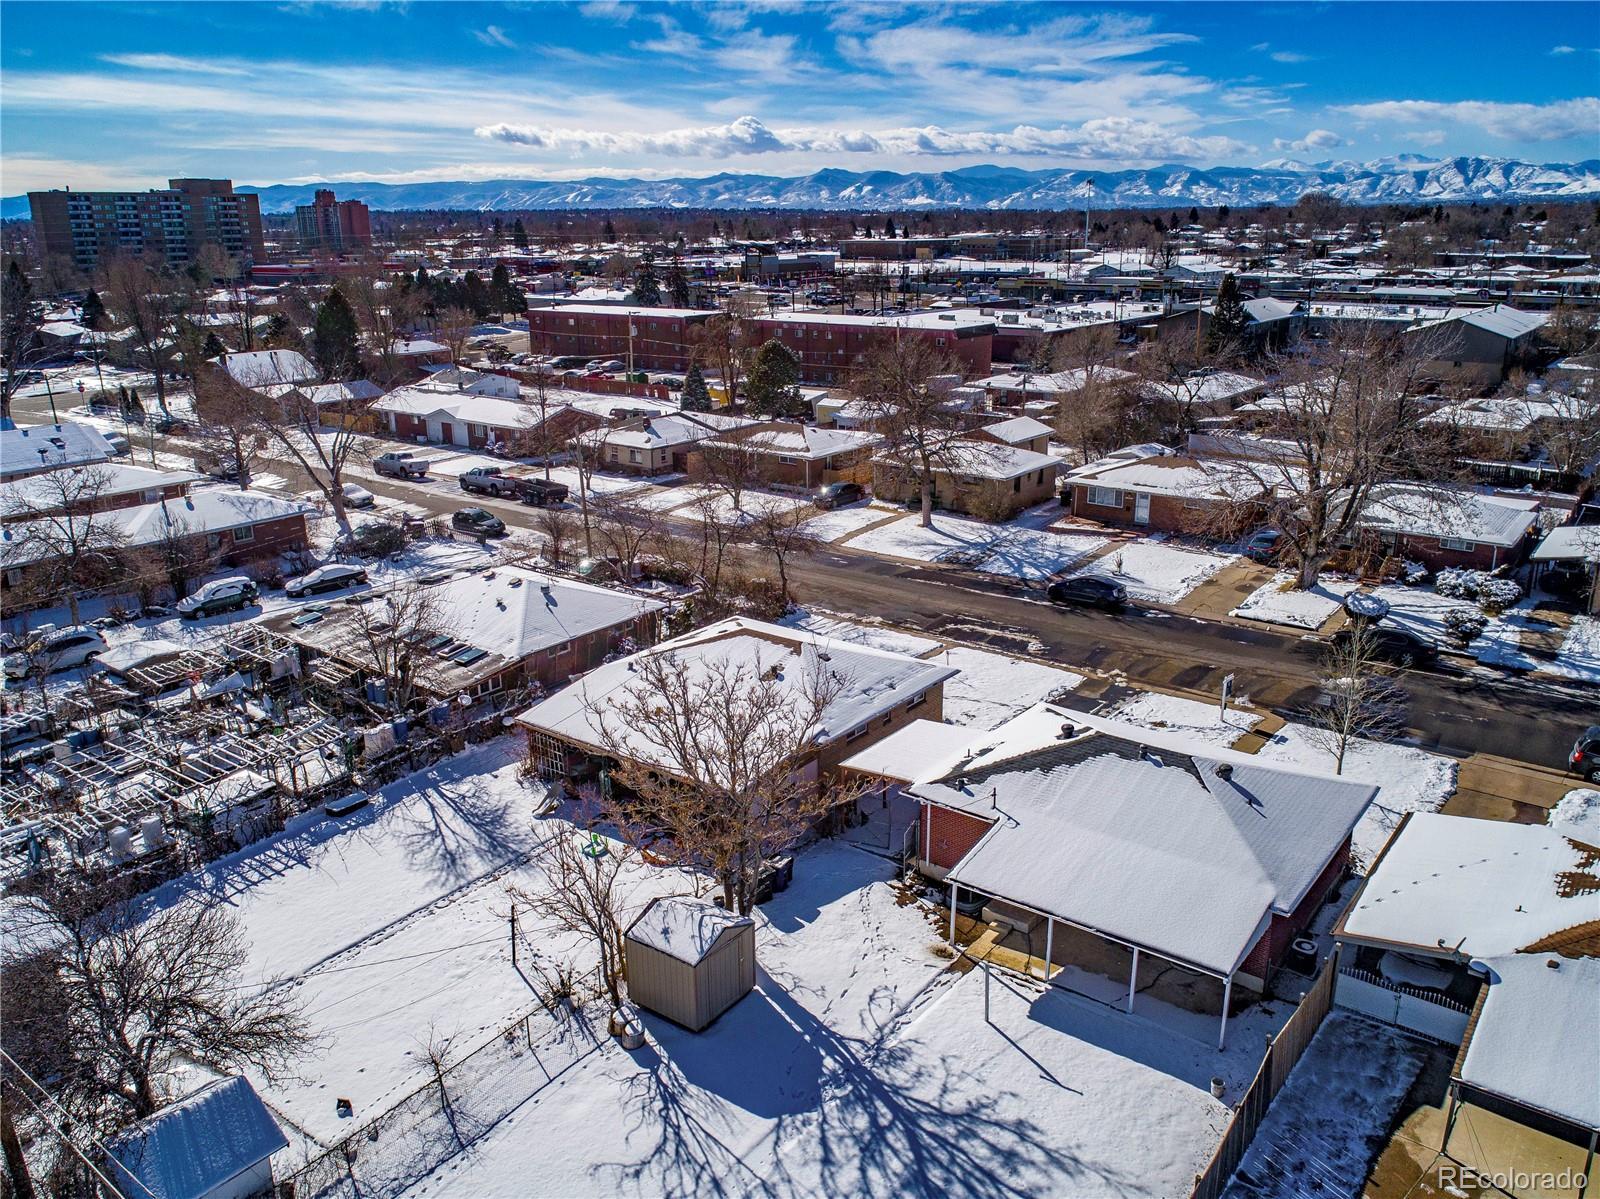 MLS# 3116030 - 3 - 1020 S Decatur Street, Denver, CO 80219